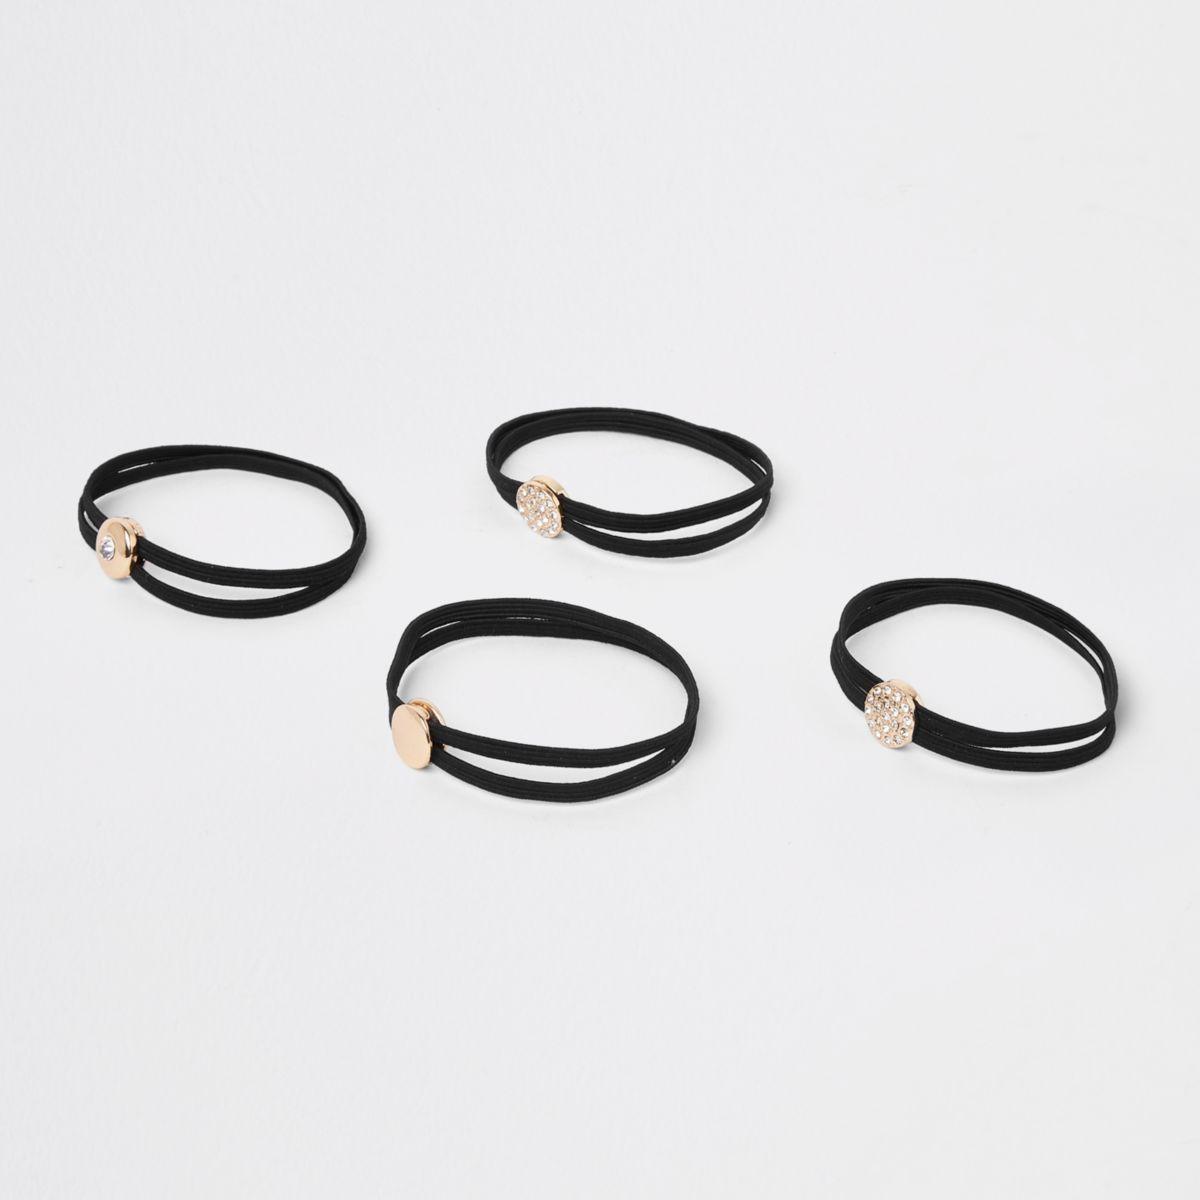 Black studded hair tie pack